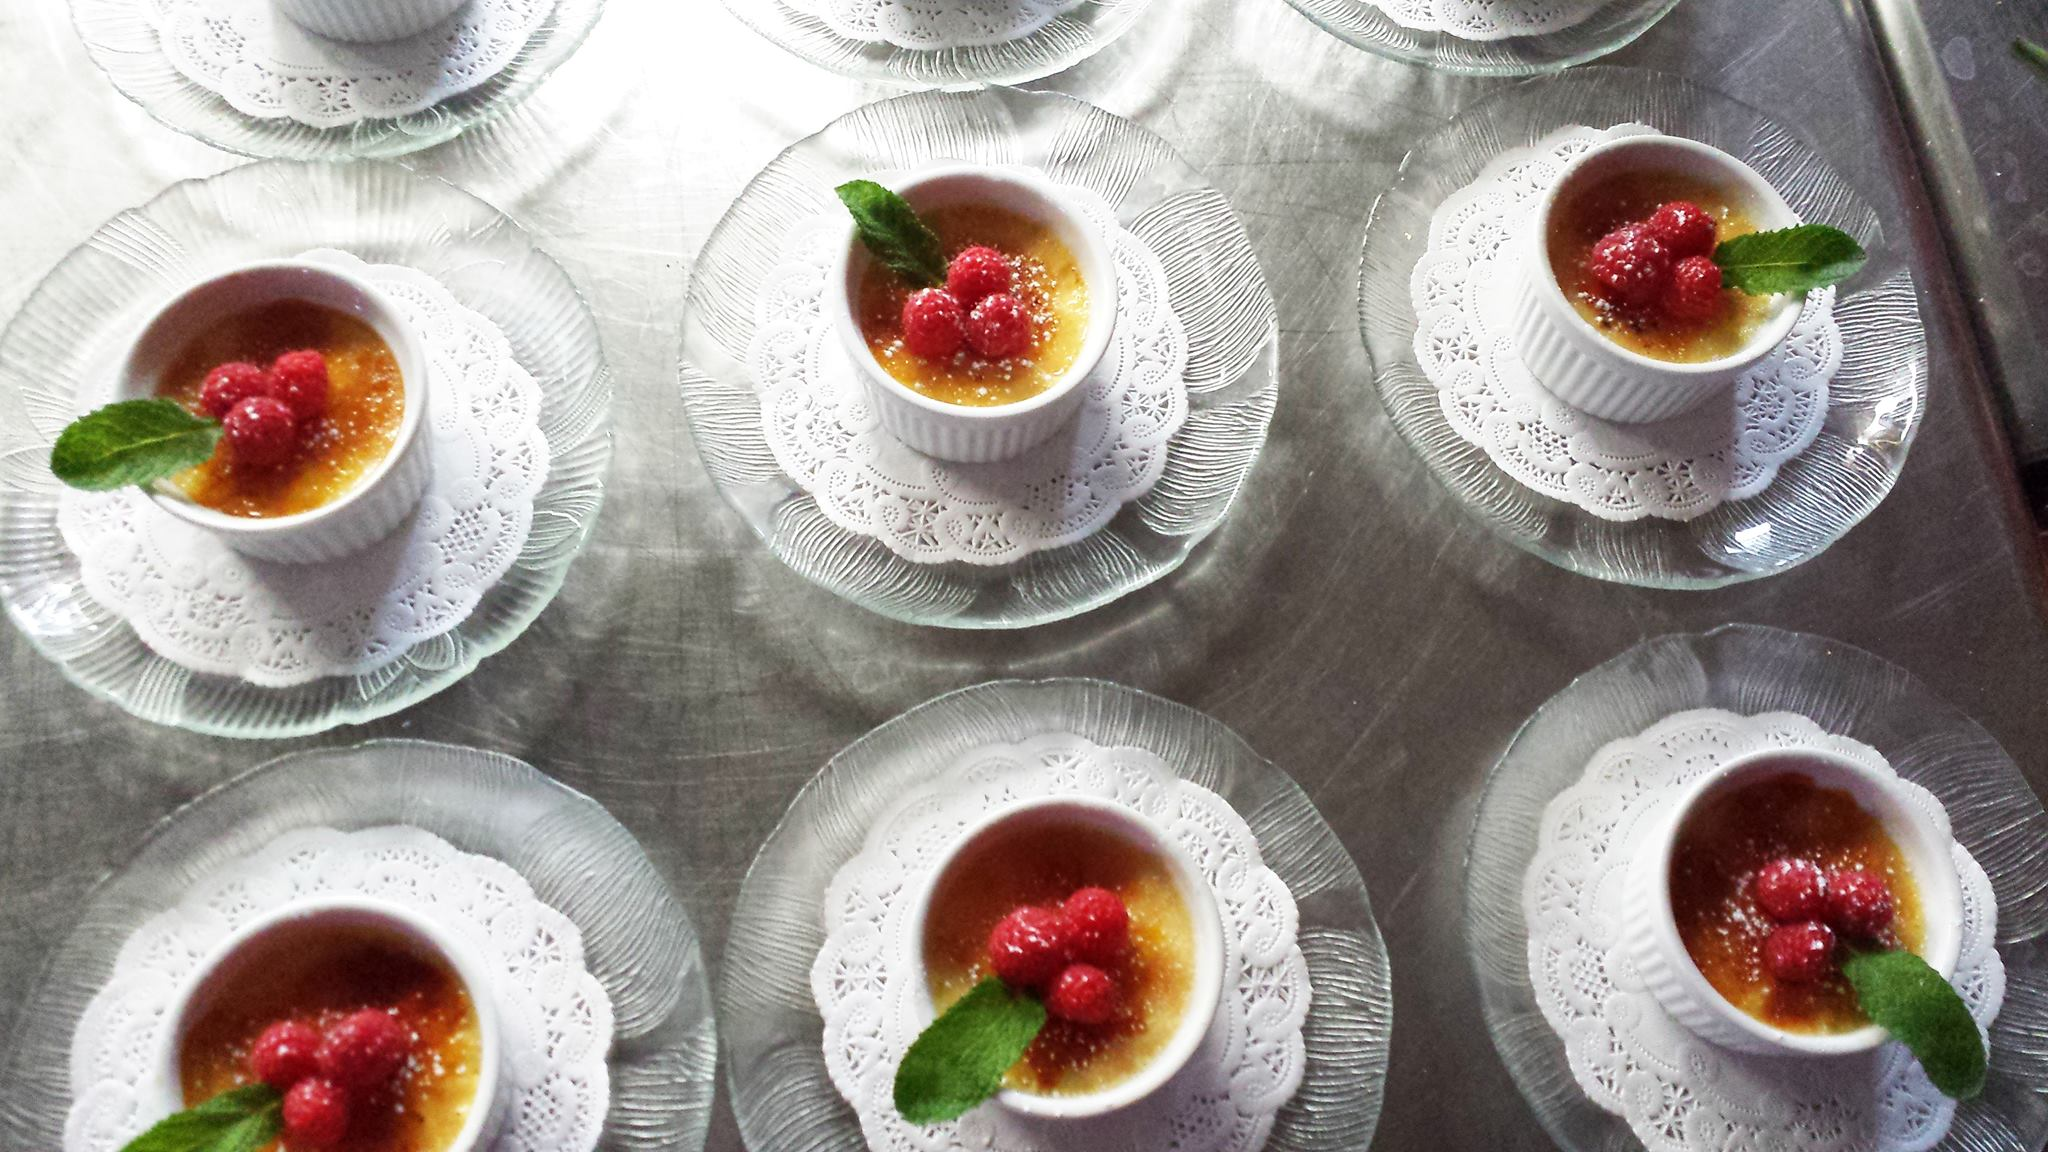 Creme Brulee with Orange Liqueur and Raspberries